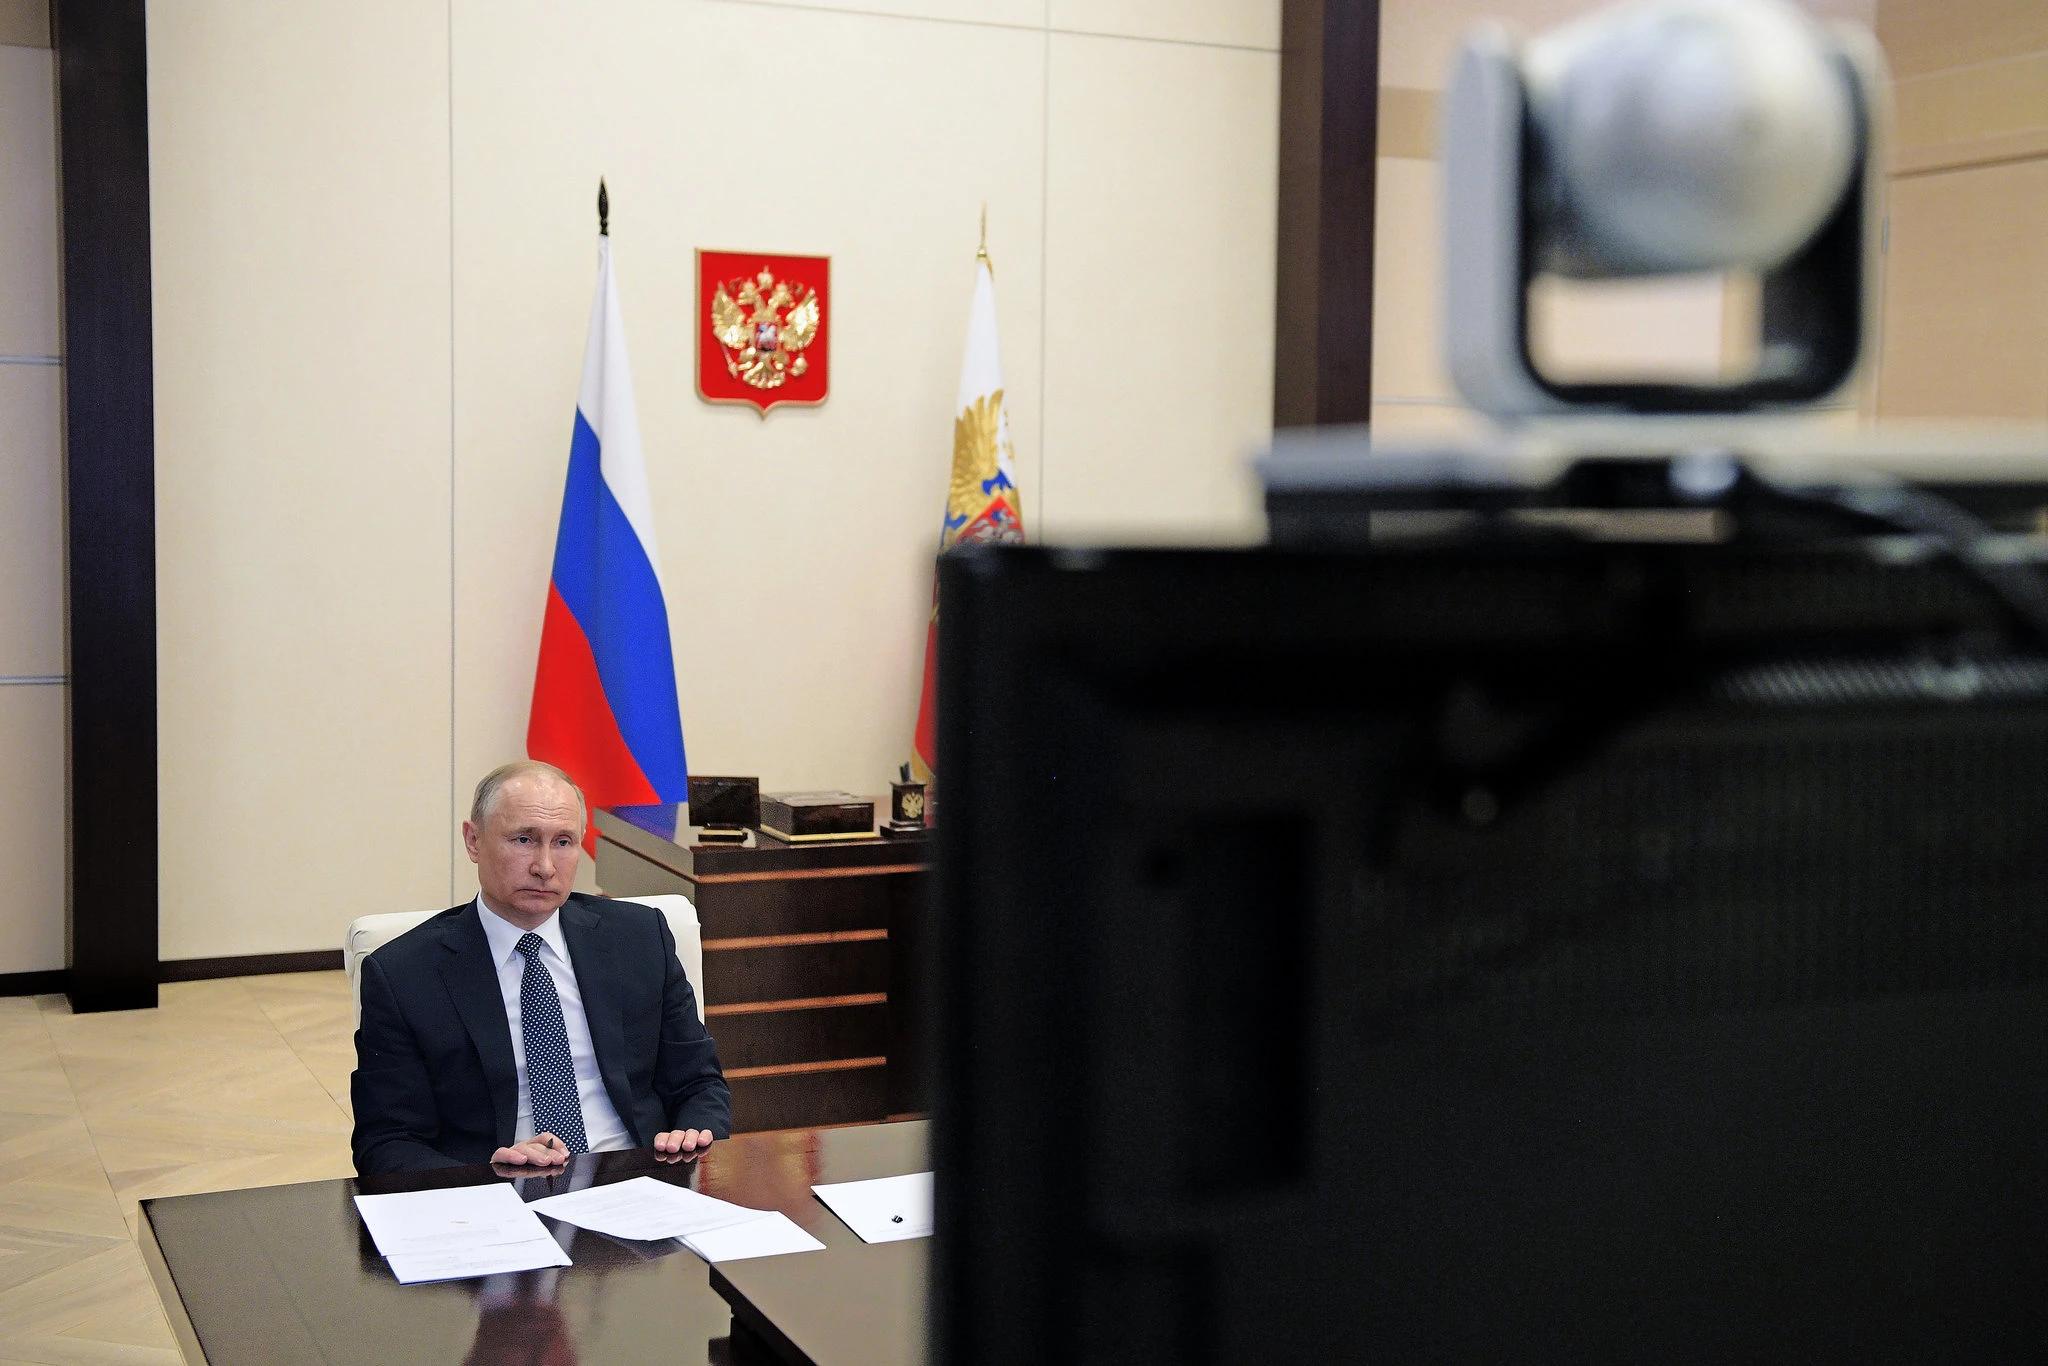 NYT Discovered Who's Behind U.S.' COVID-19 Panic: It's Vladimir Putin